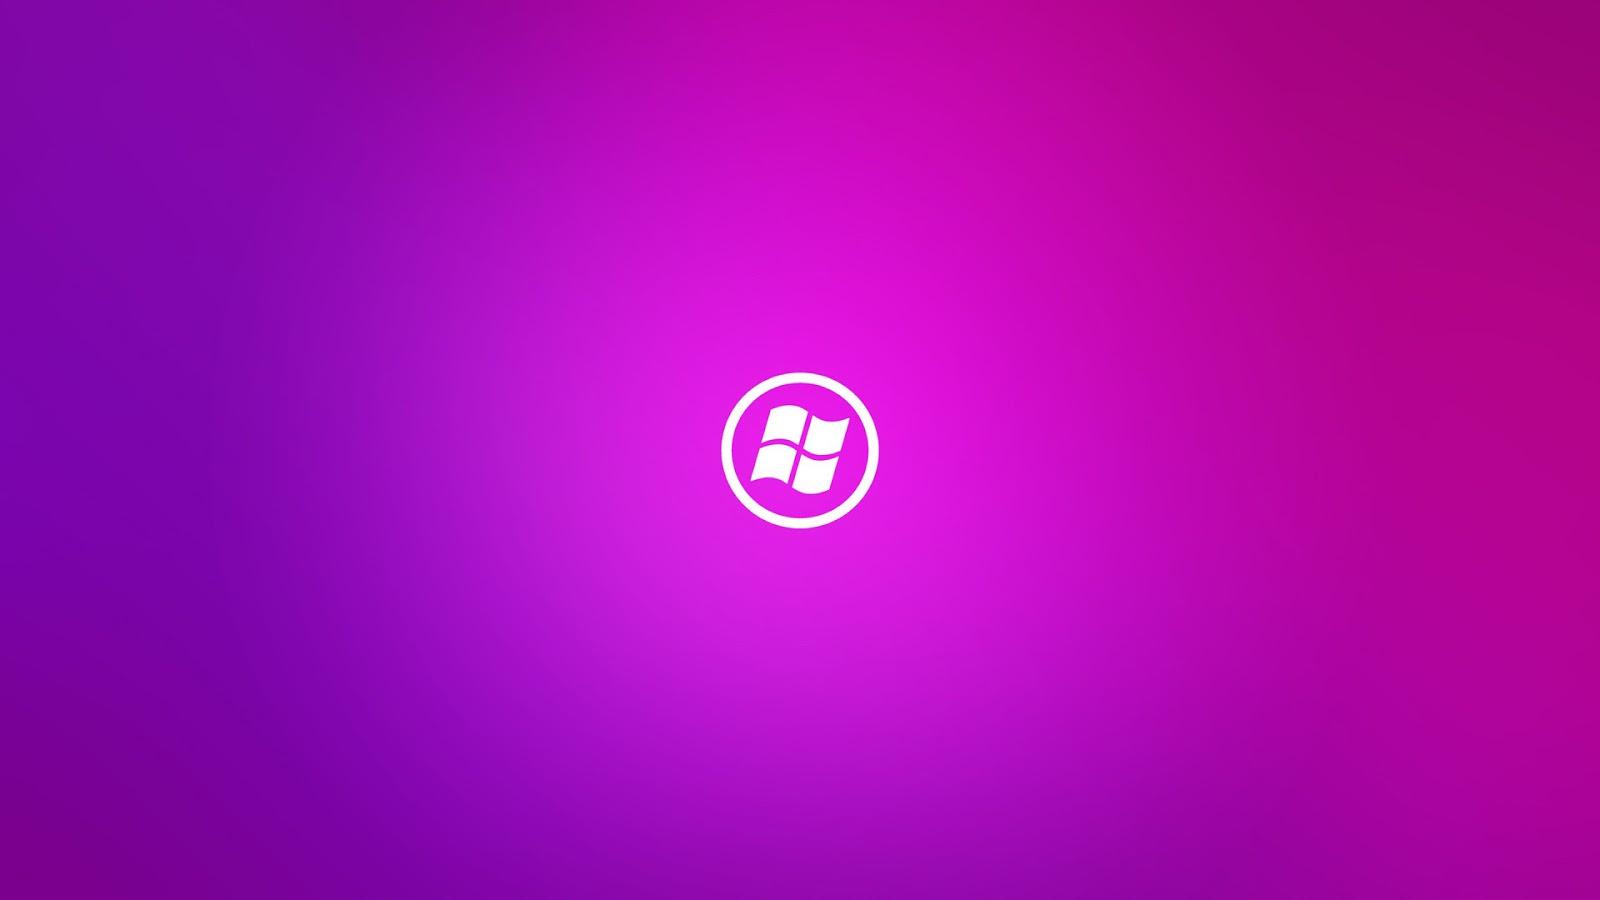 Pubg Hd Wallpaper For Windows 7: Windows 8 Full HD Wallpapers 1080p